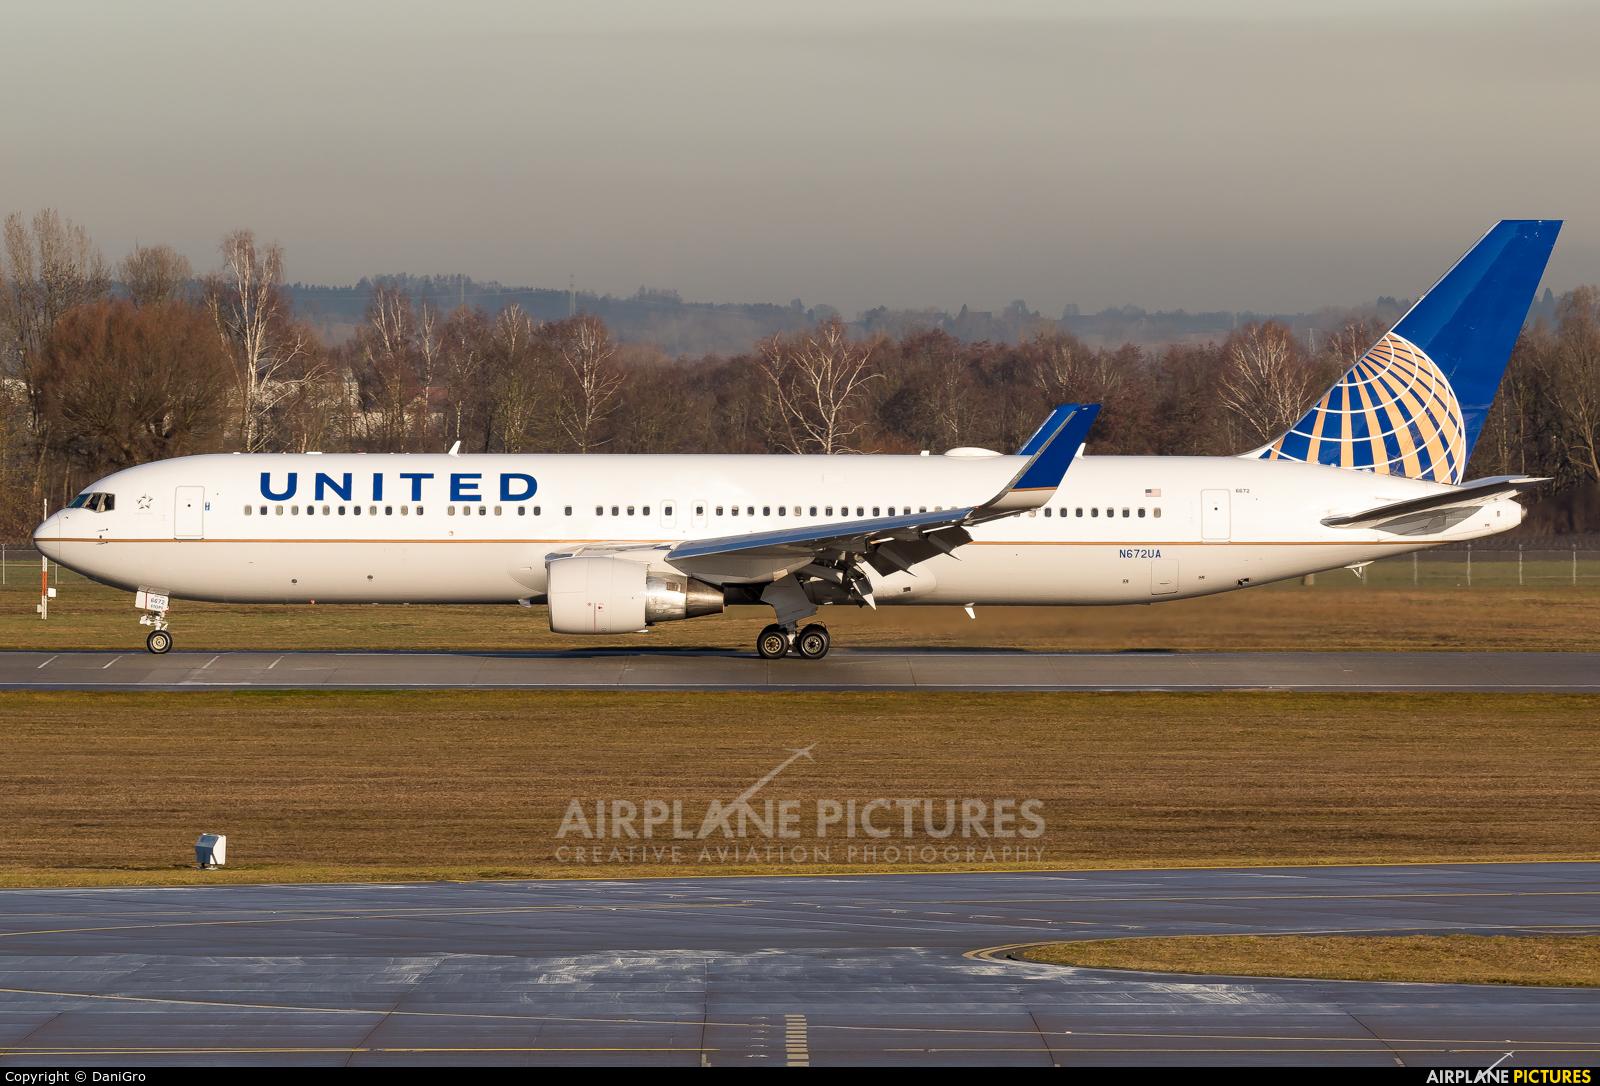 United Airlines N672UA aircraft at Munich